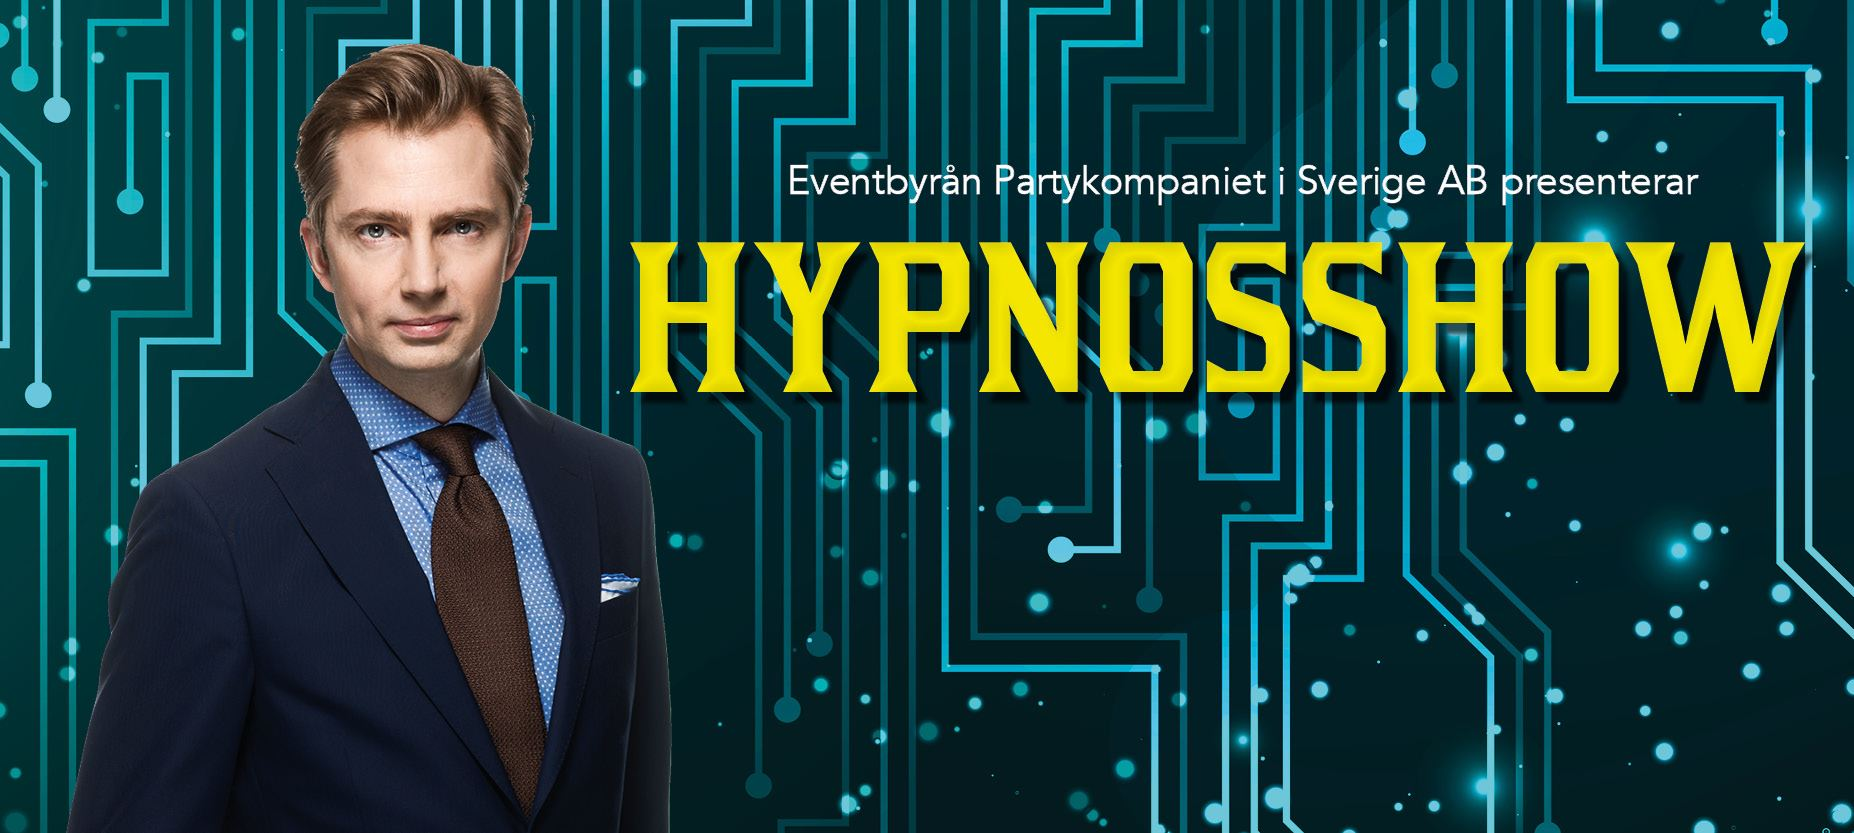 Hypnosshow